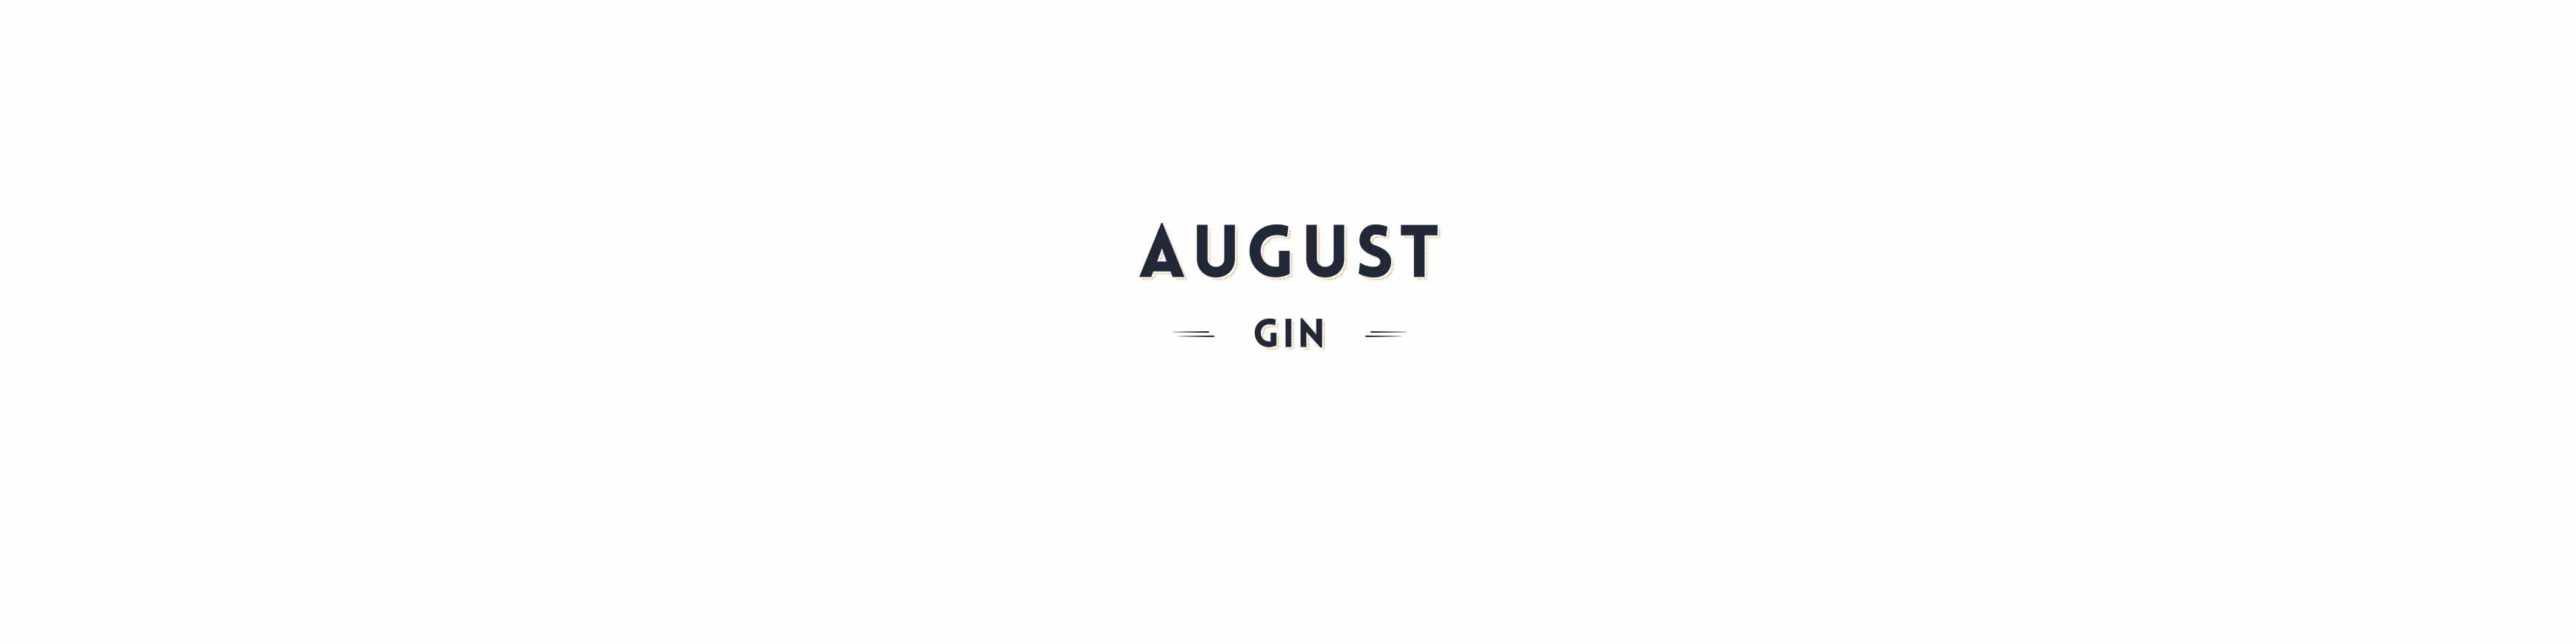 13-logo-august-gin-augsburg-design-branding